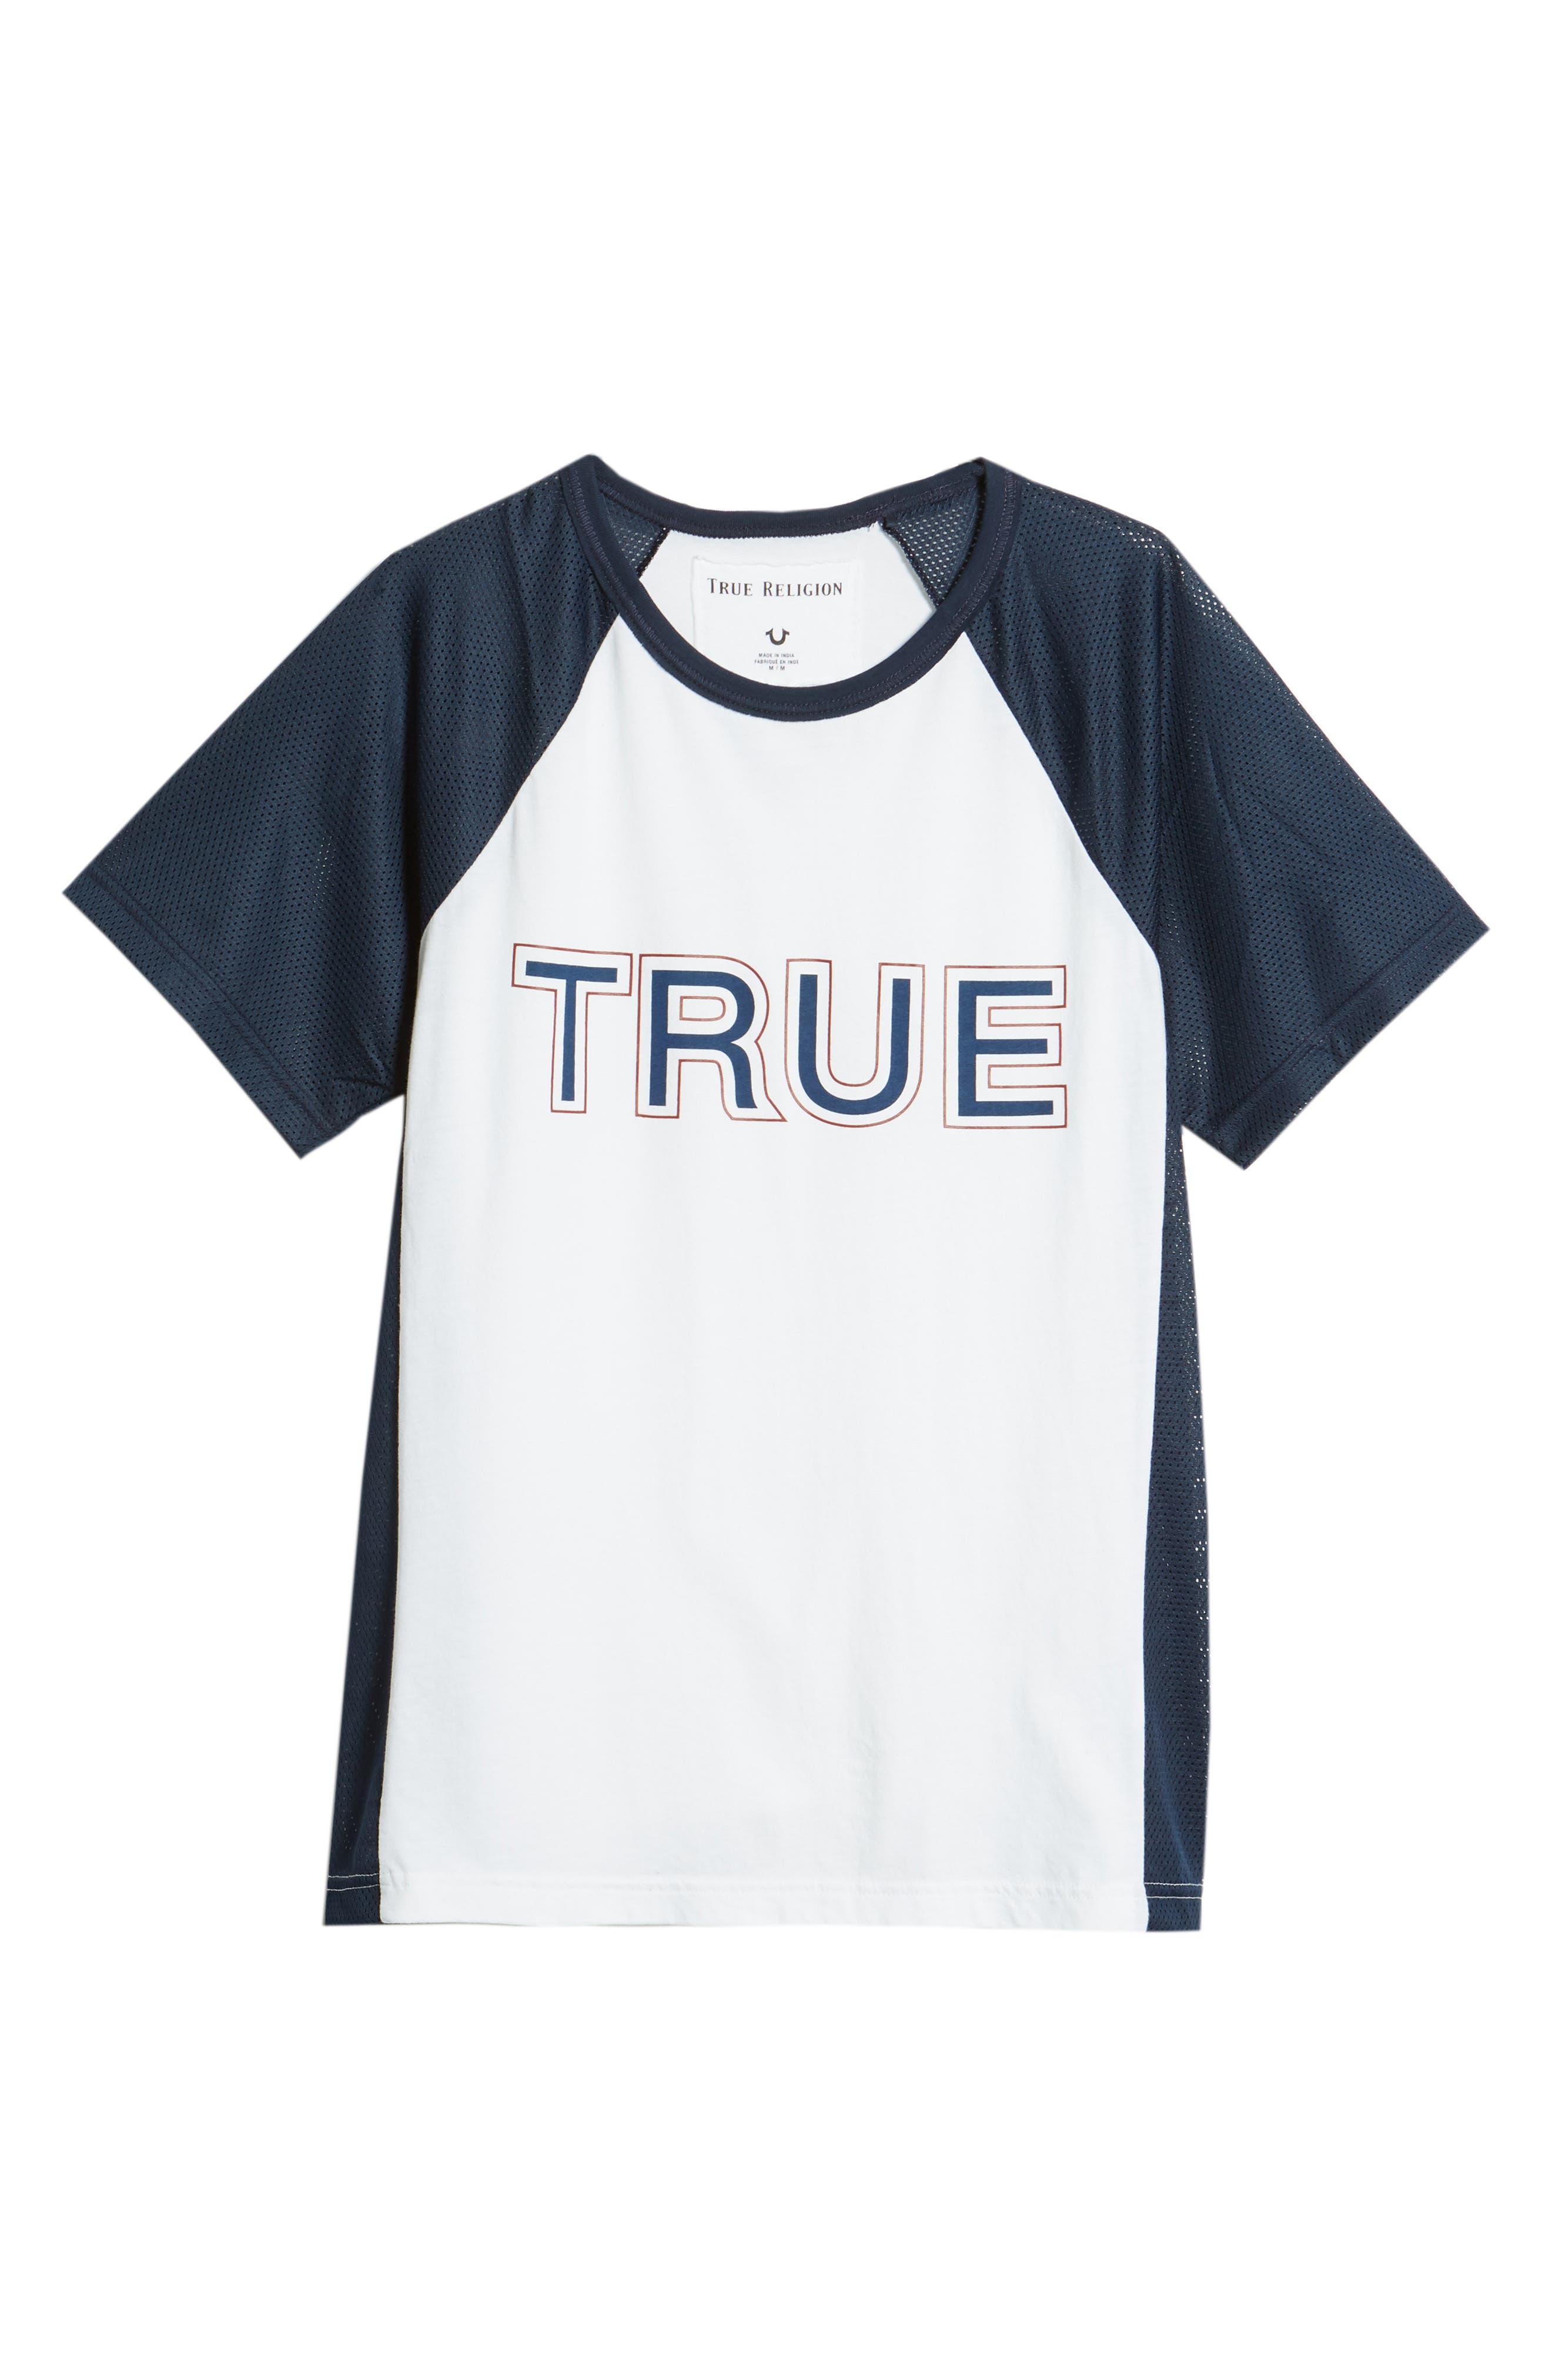 Contrast Raglan T-Shirt,                             Alternate thumbnail 6, color,                             Ace Blue/ Optic White Combo